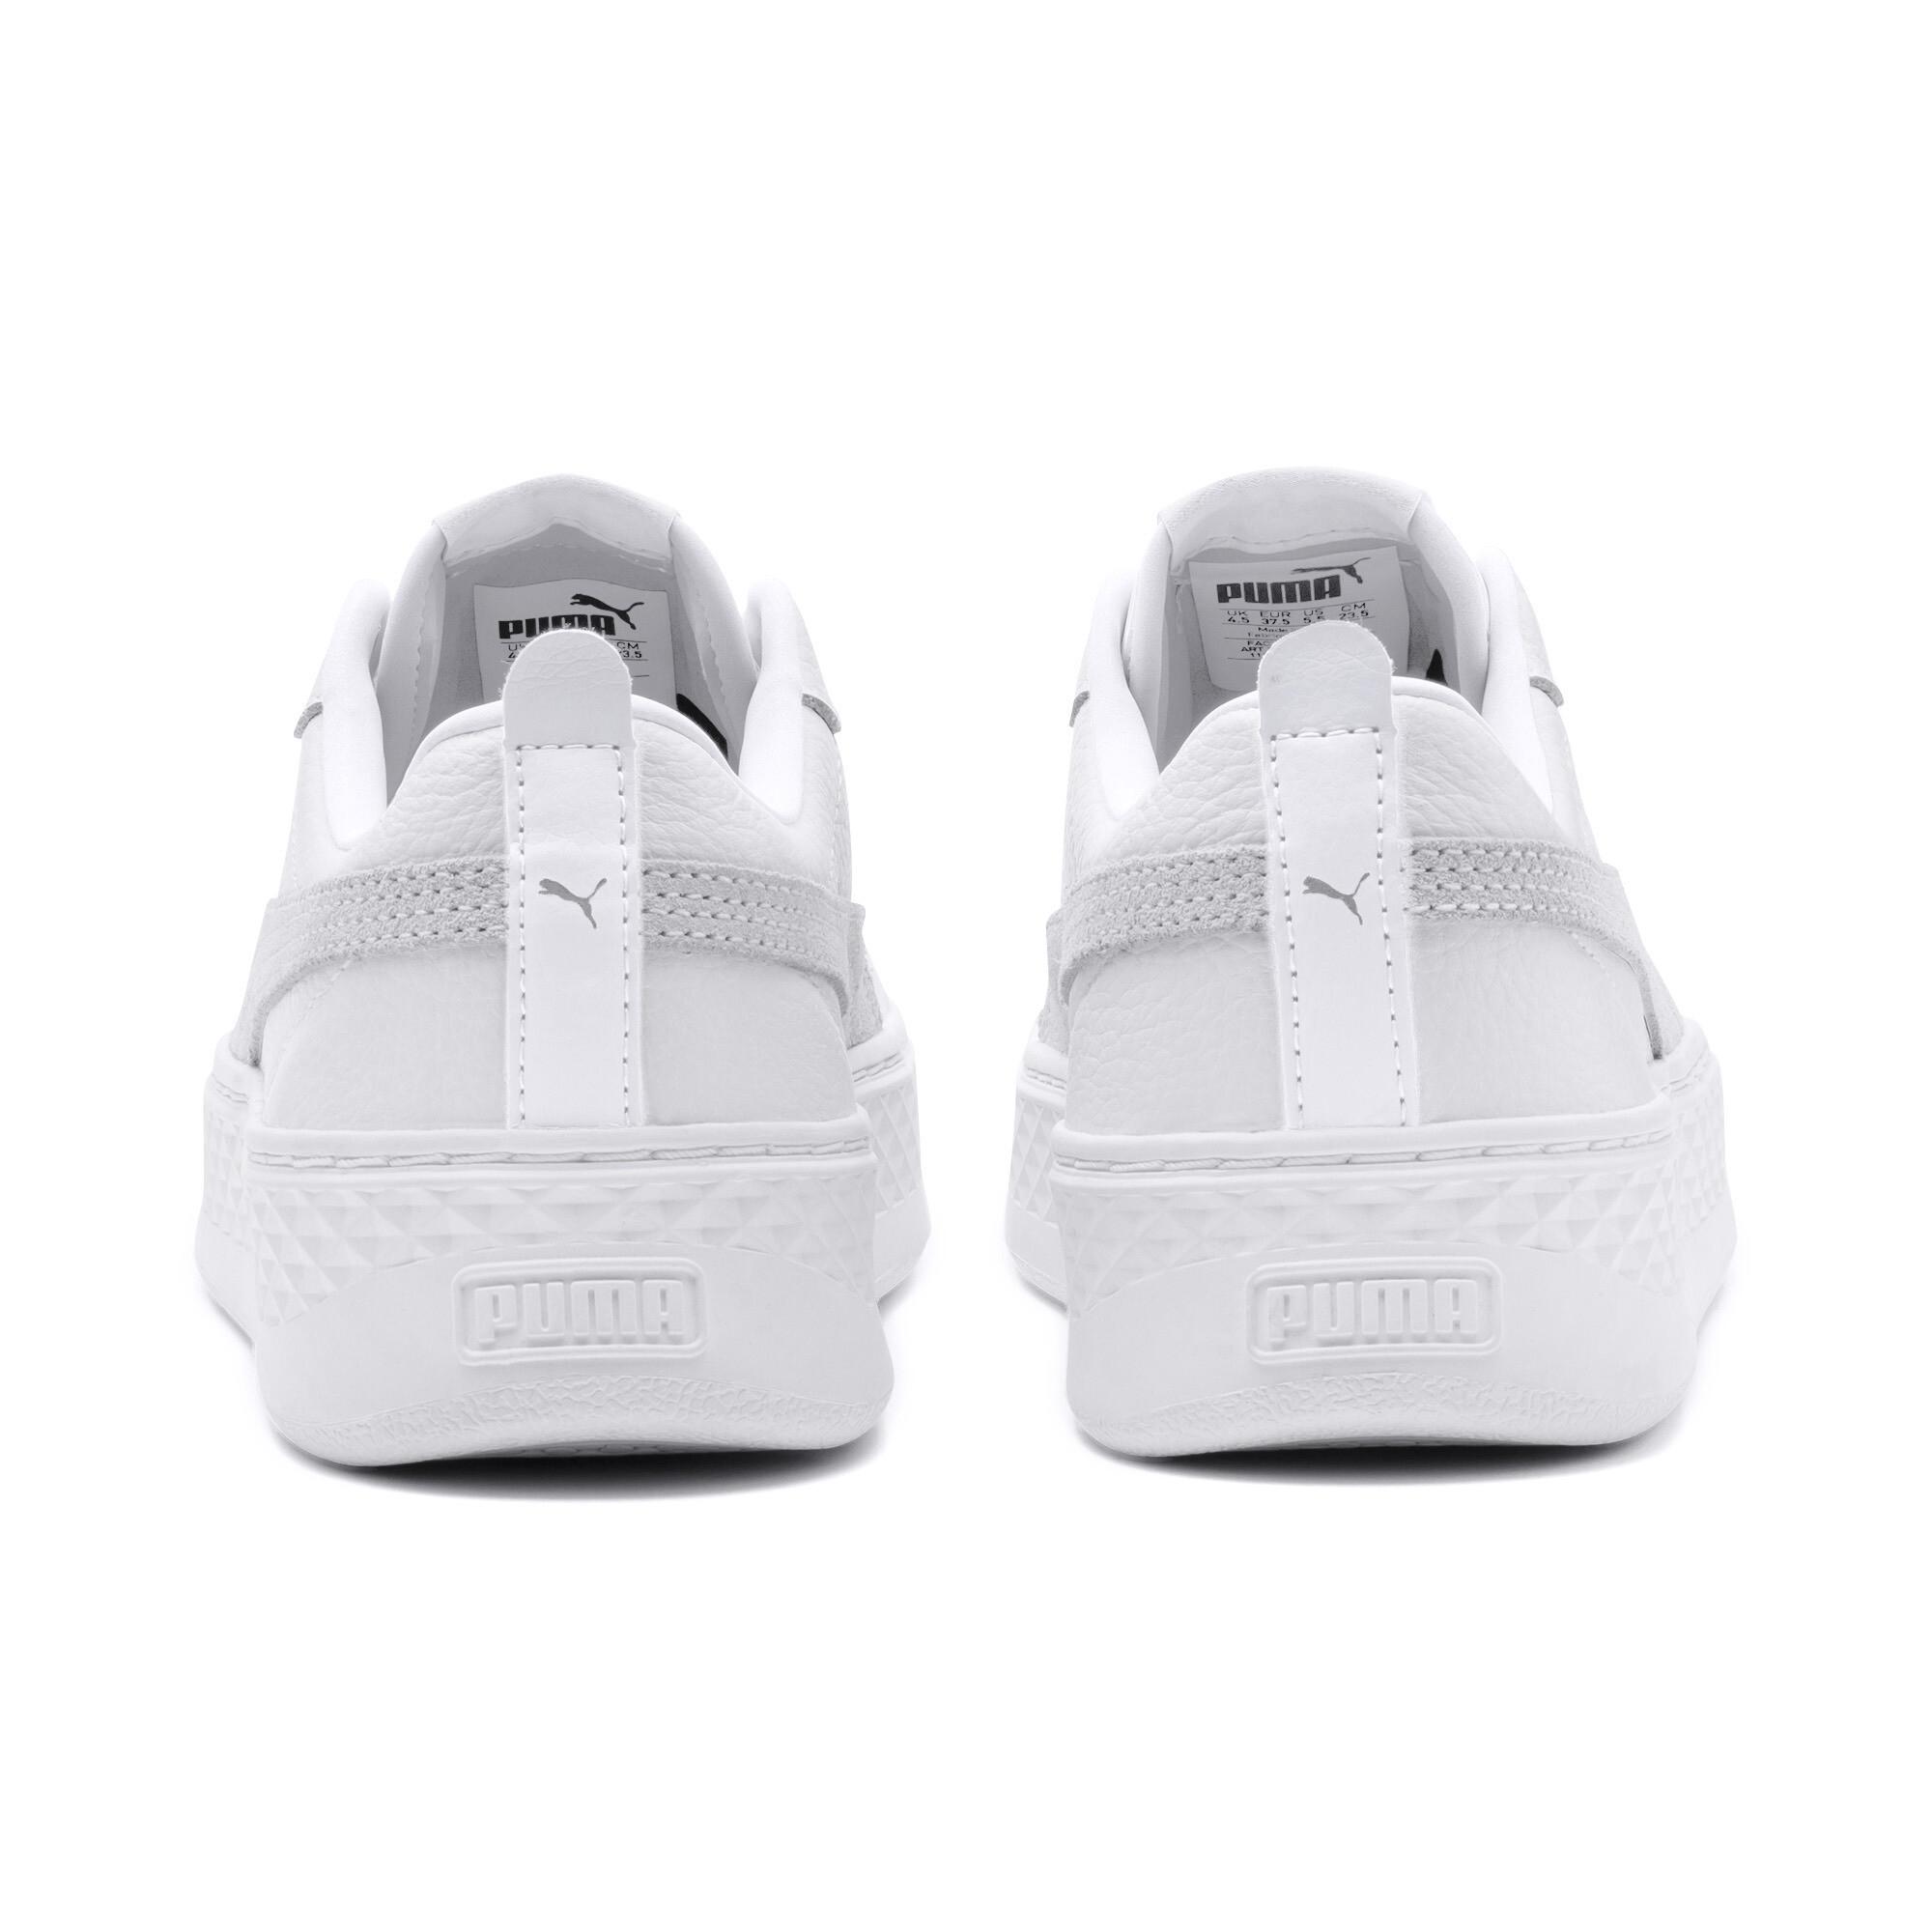 PUMA-Smash-Platform-Leather-Women-039-s-Sneakers-Women-Shoe-Basics thumbnail 3